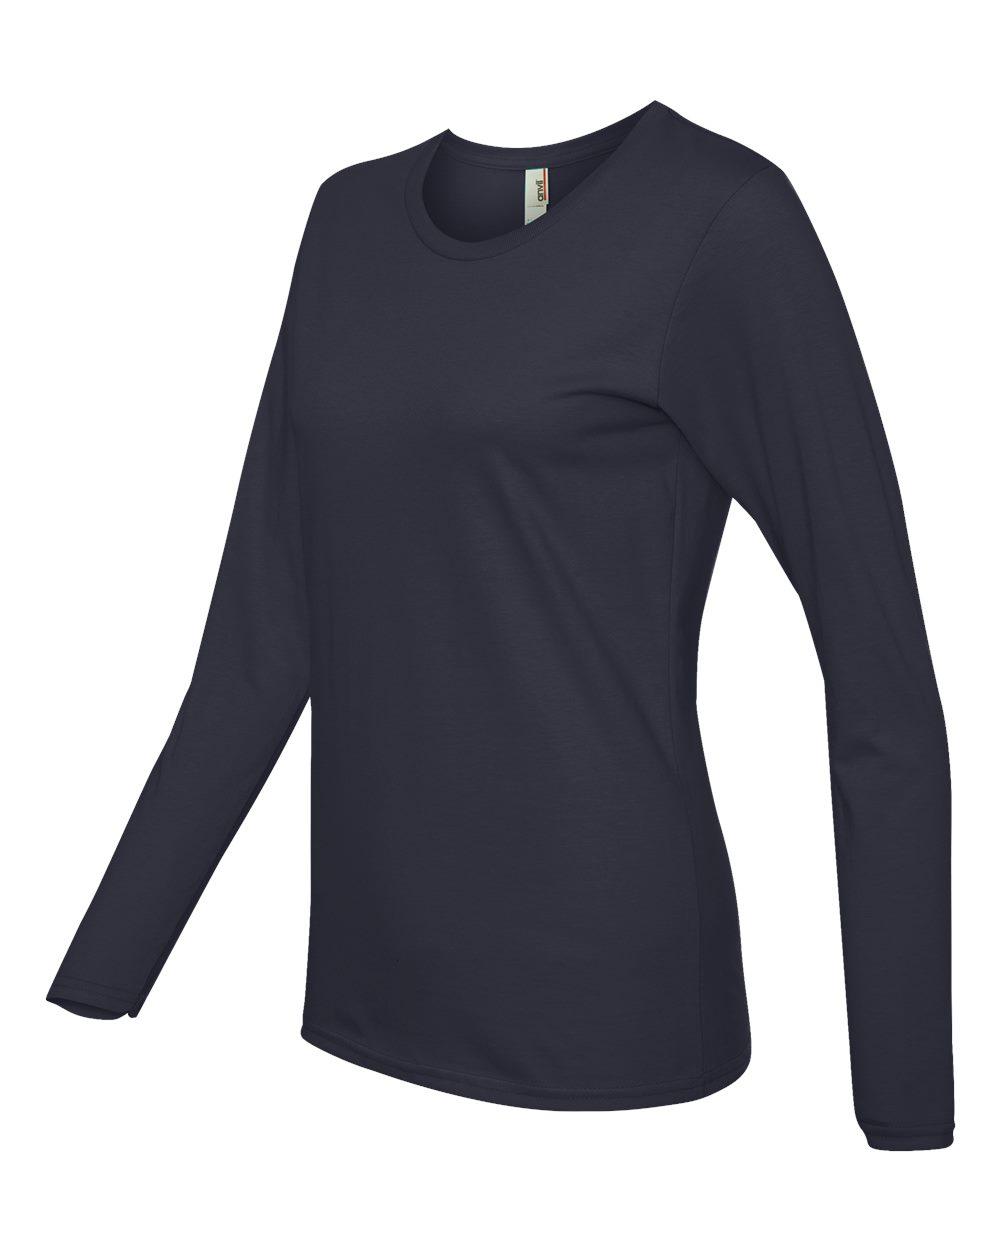 Anvil-Womens-Lightweight-Long-Sleeve-T-Shirt-884L-Size-S-2XL thumbnail 22